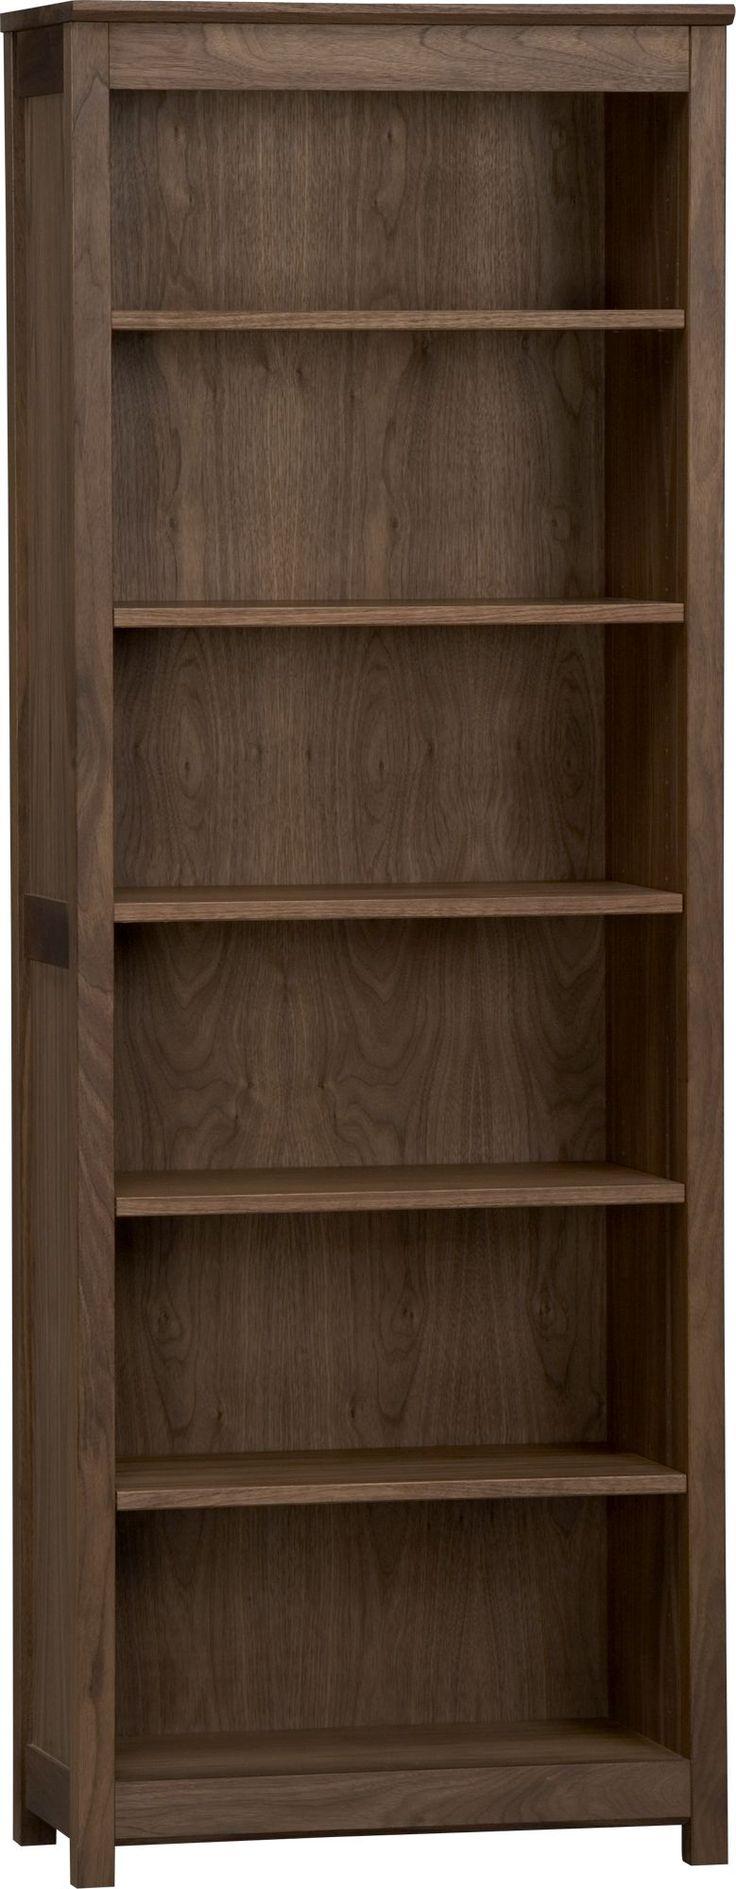 best  walnut bookcase ideas on pinterest  mid century modern  - ainsworth walnut bookcase  crate and barrel